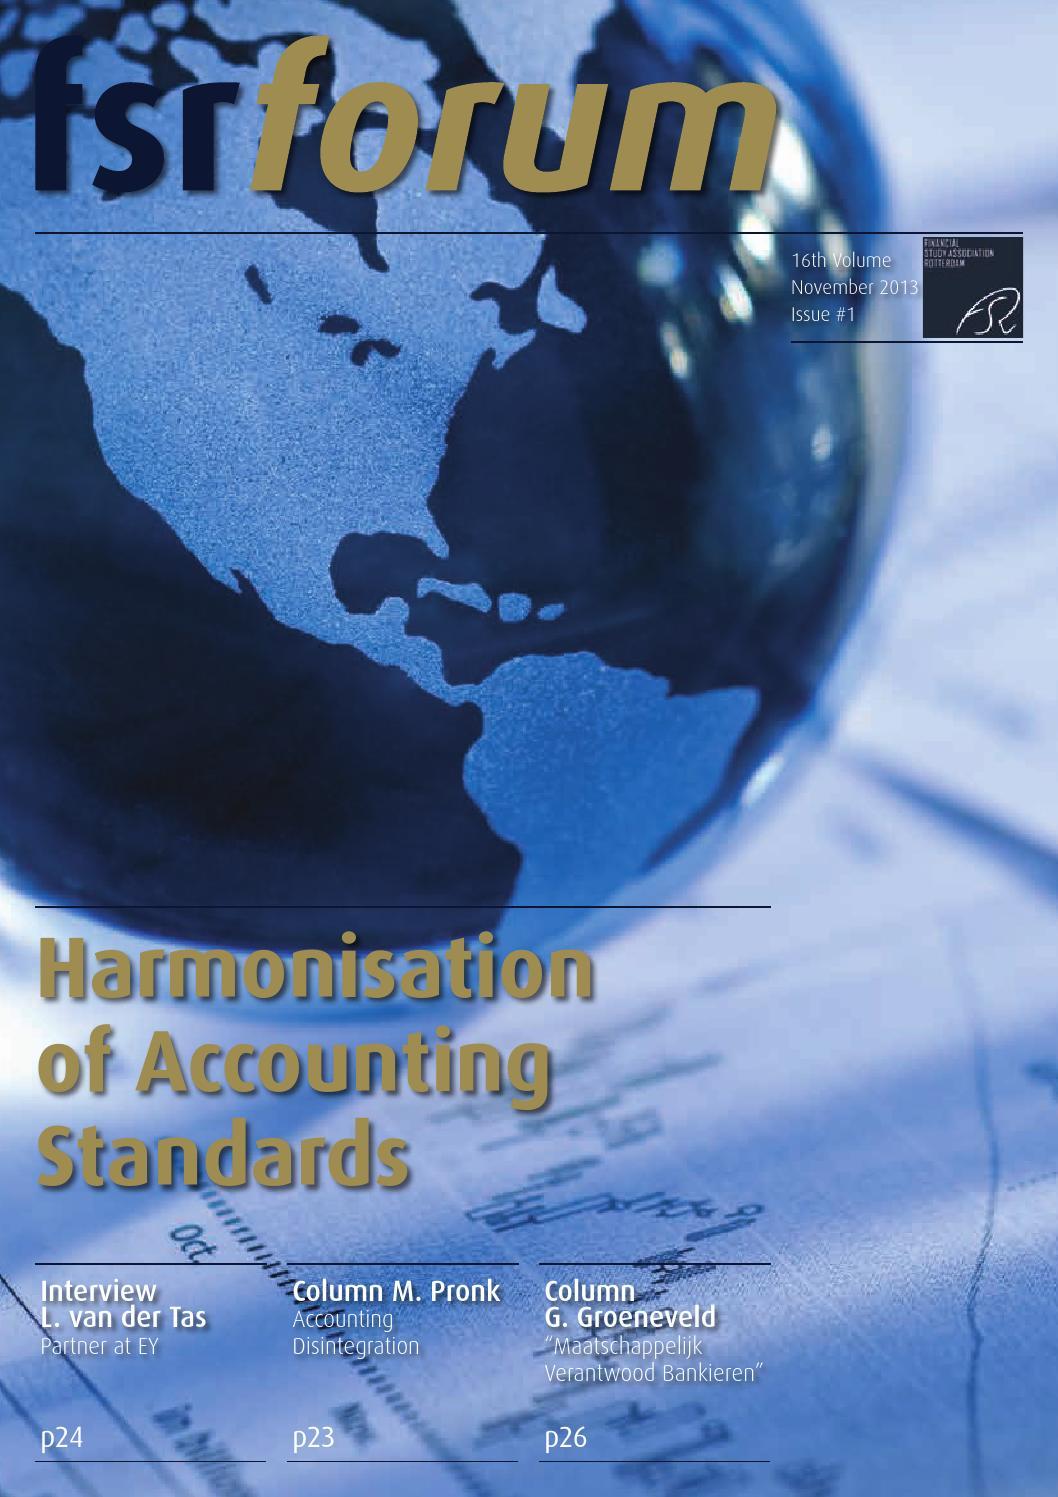 Fsr forum 16-01 Harmonisation of Accounting Standards by Eefke van